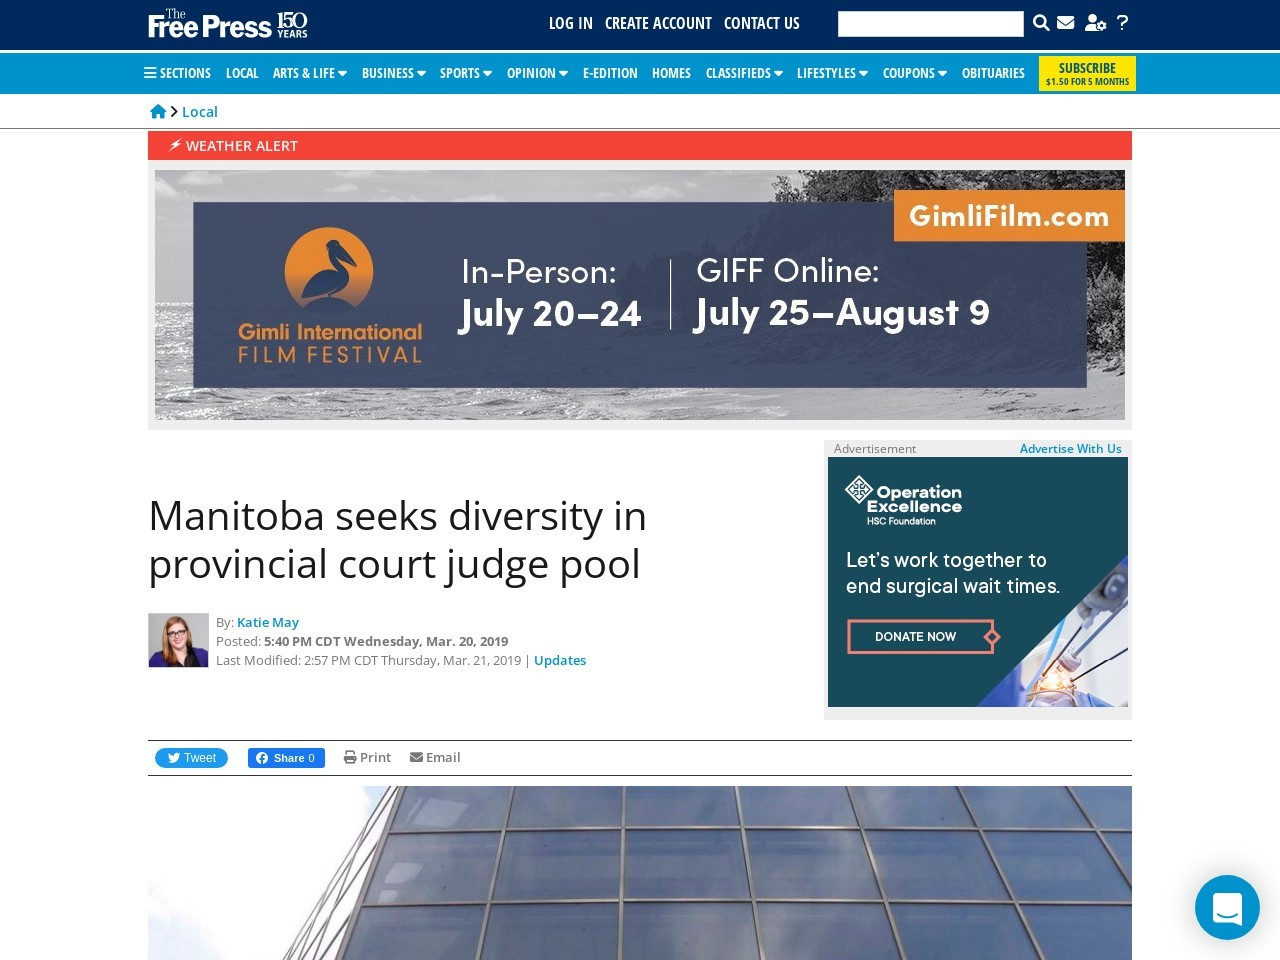 Manitoba seeks diversity in provincial court judge pool